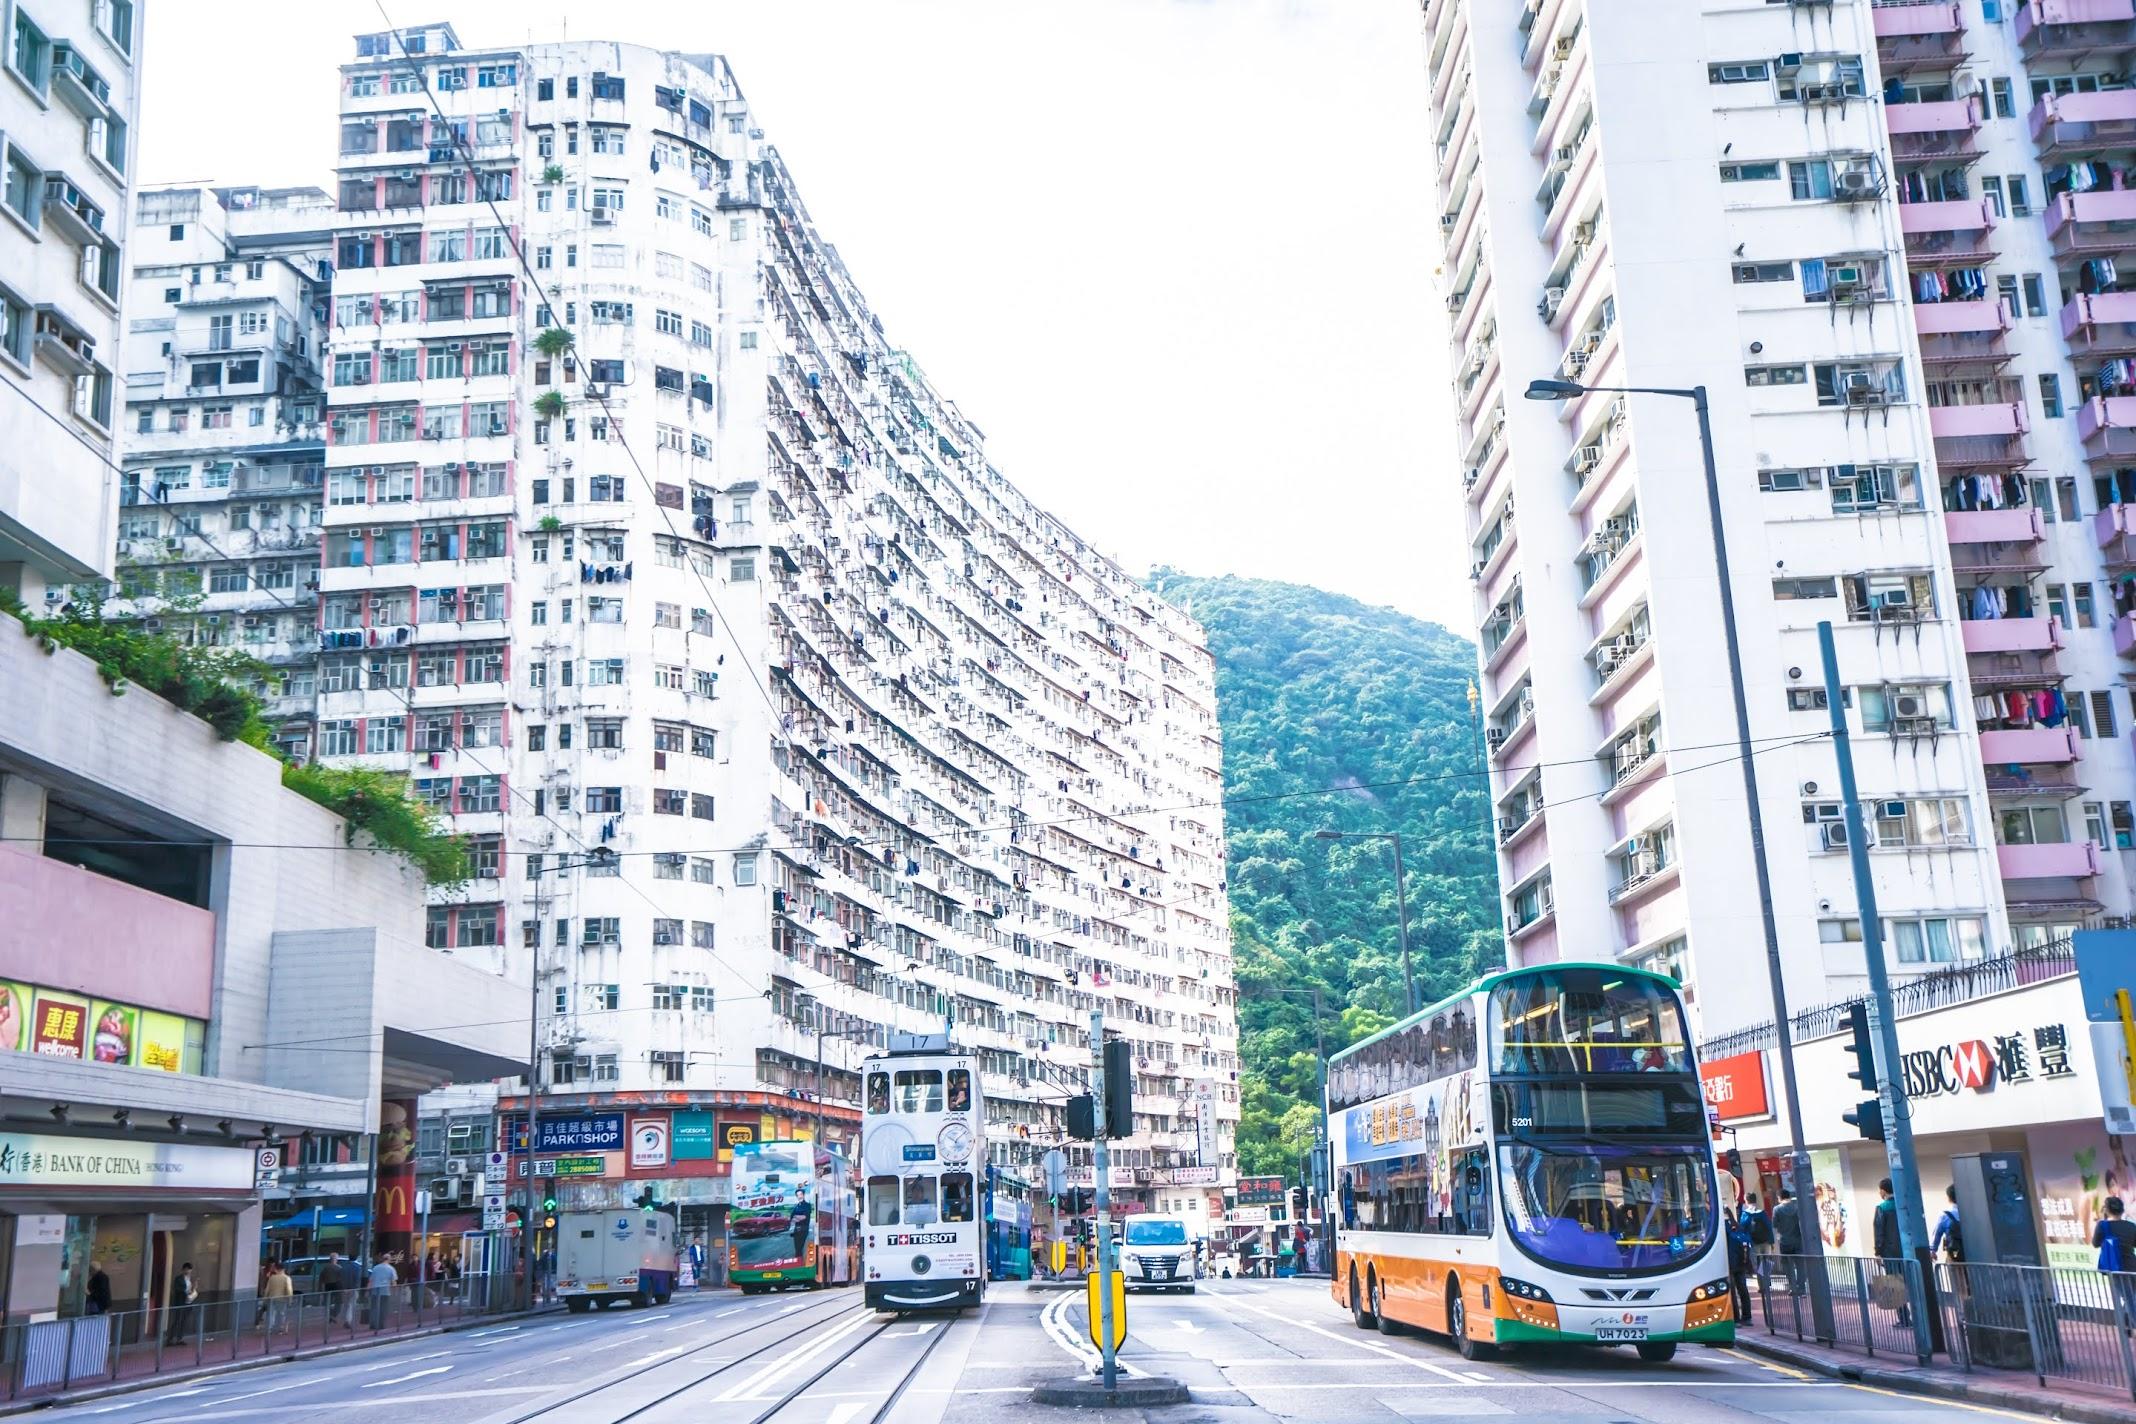 Hong Kong Tai Koo tram